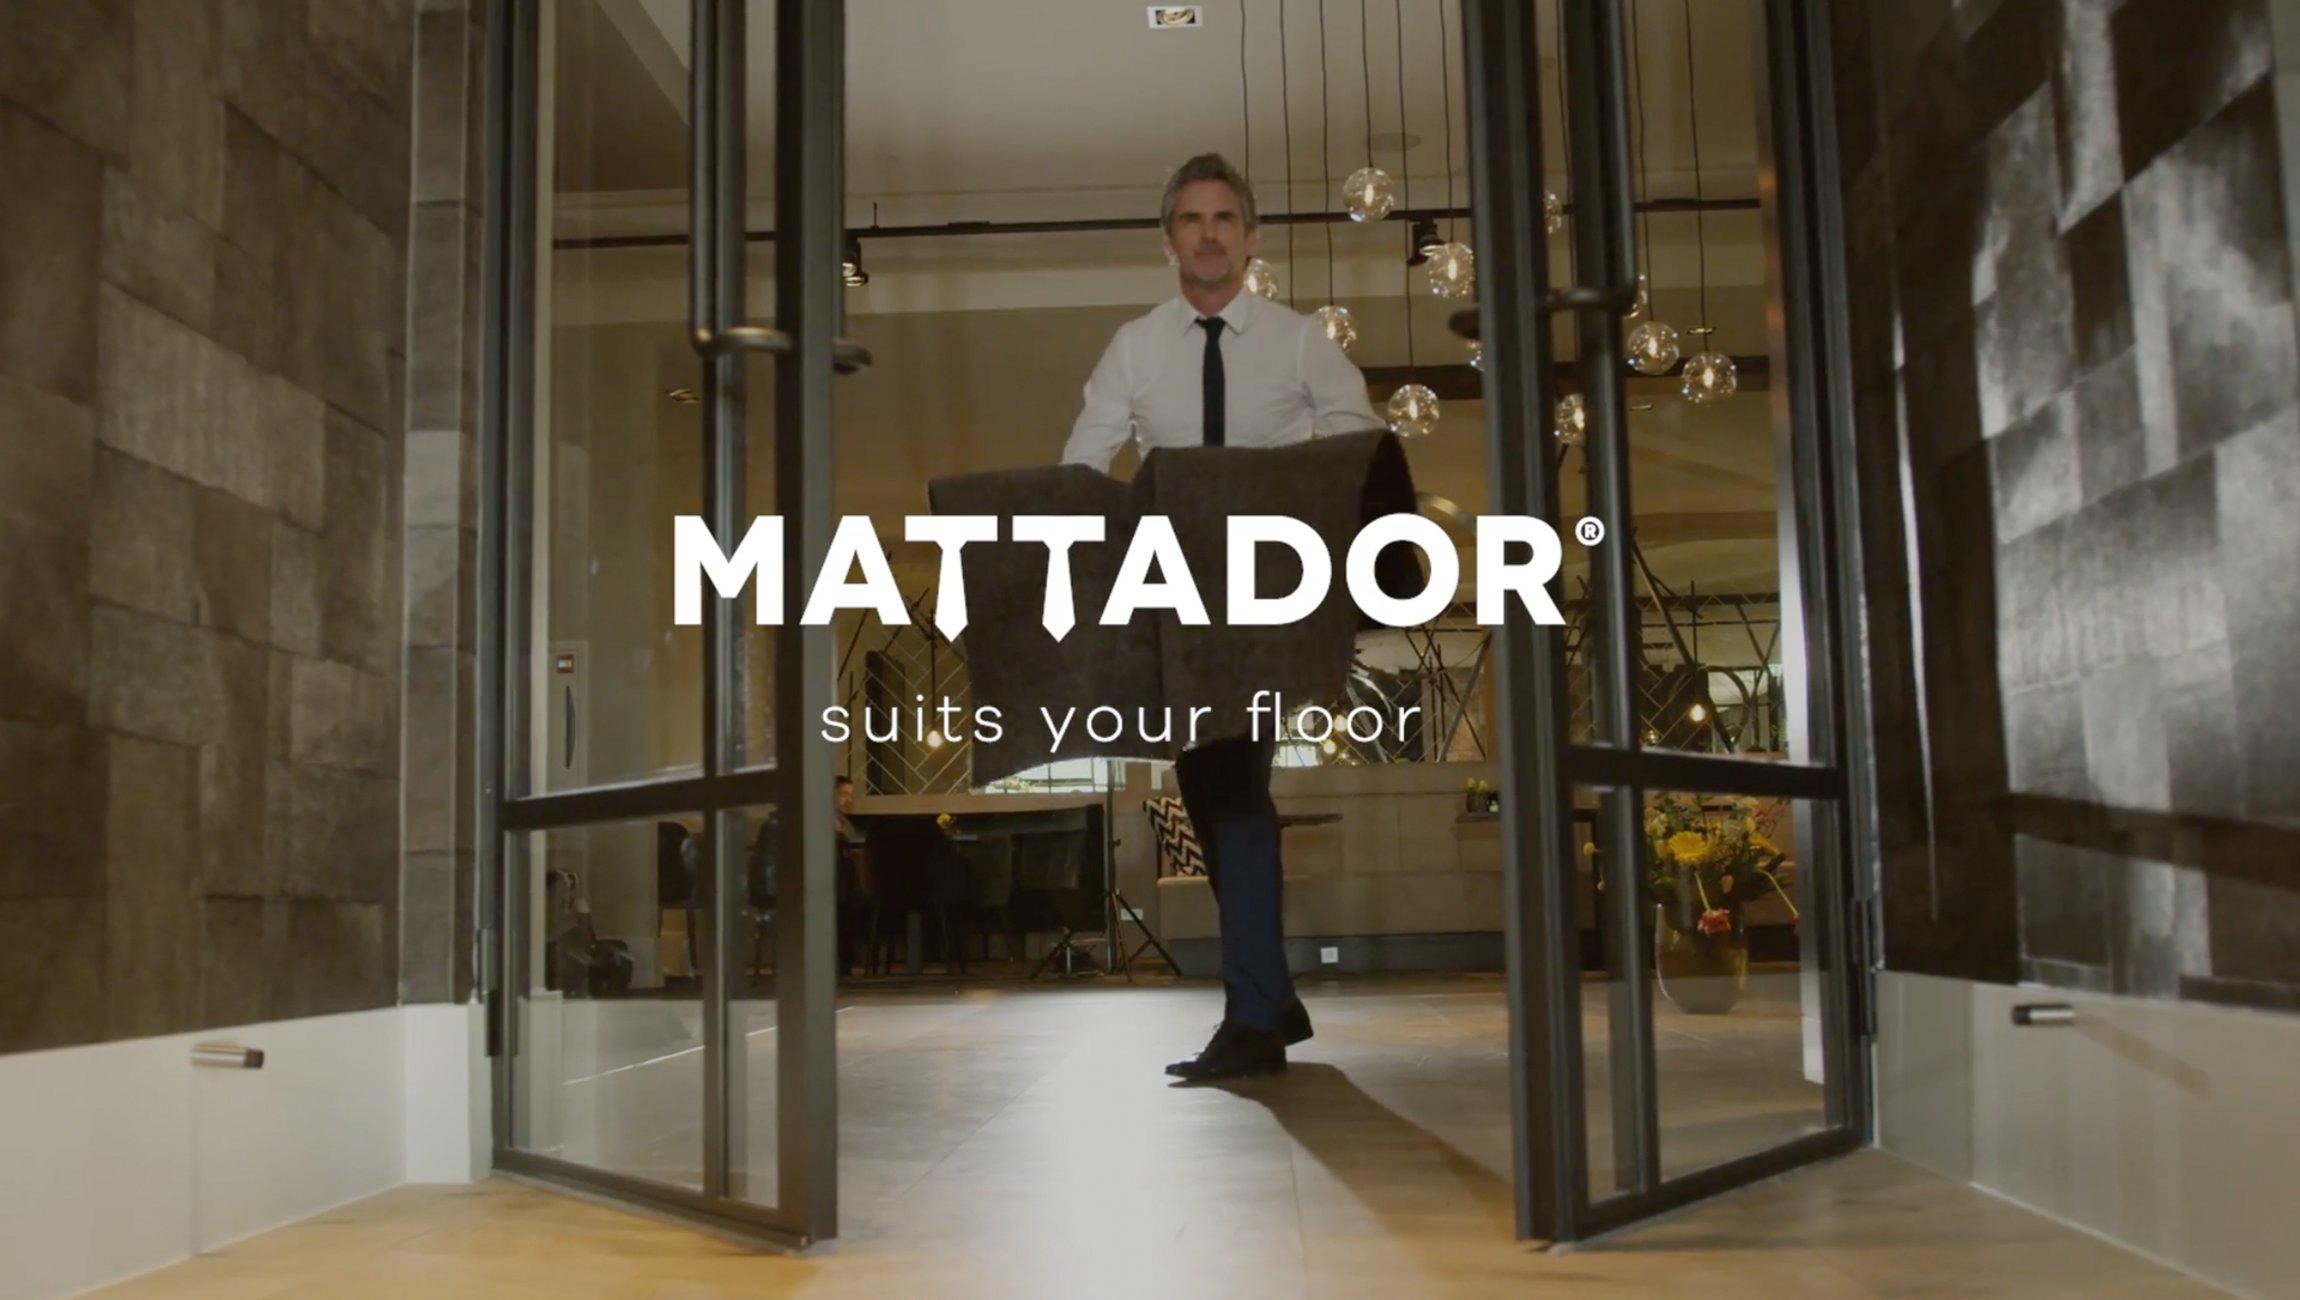 Mattador_videoslider_case-hero_2300x1300